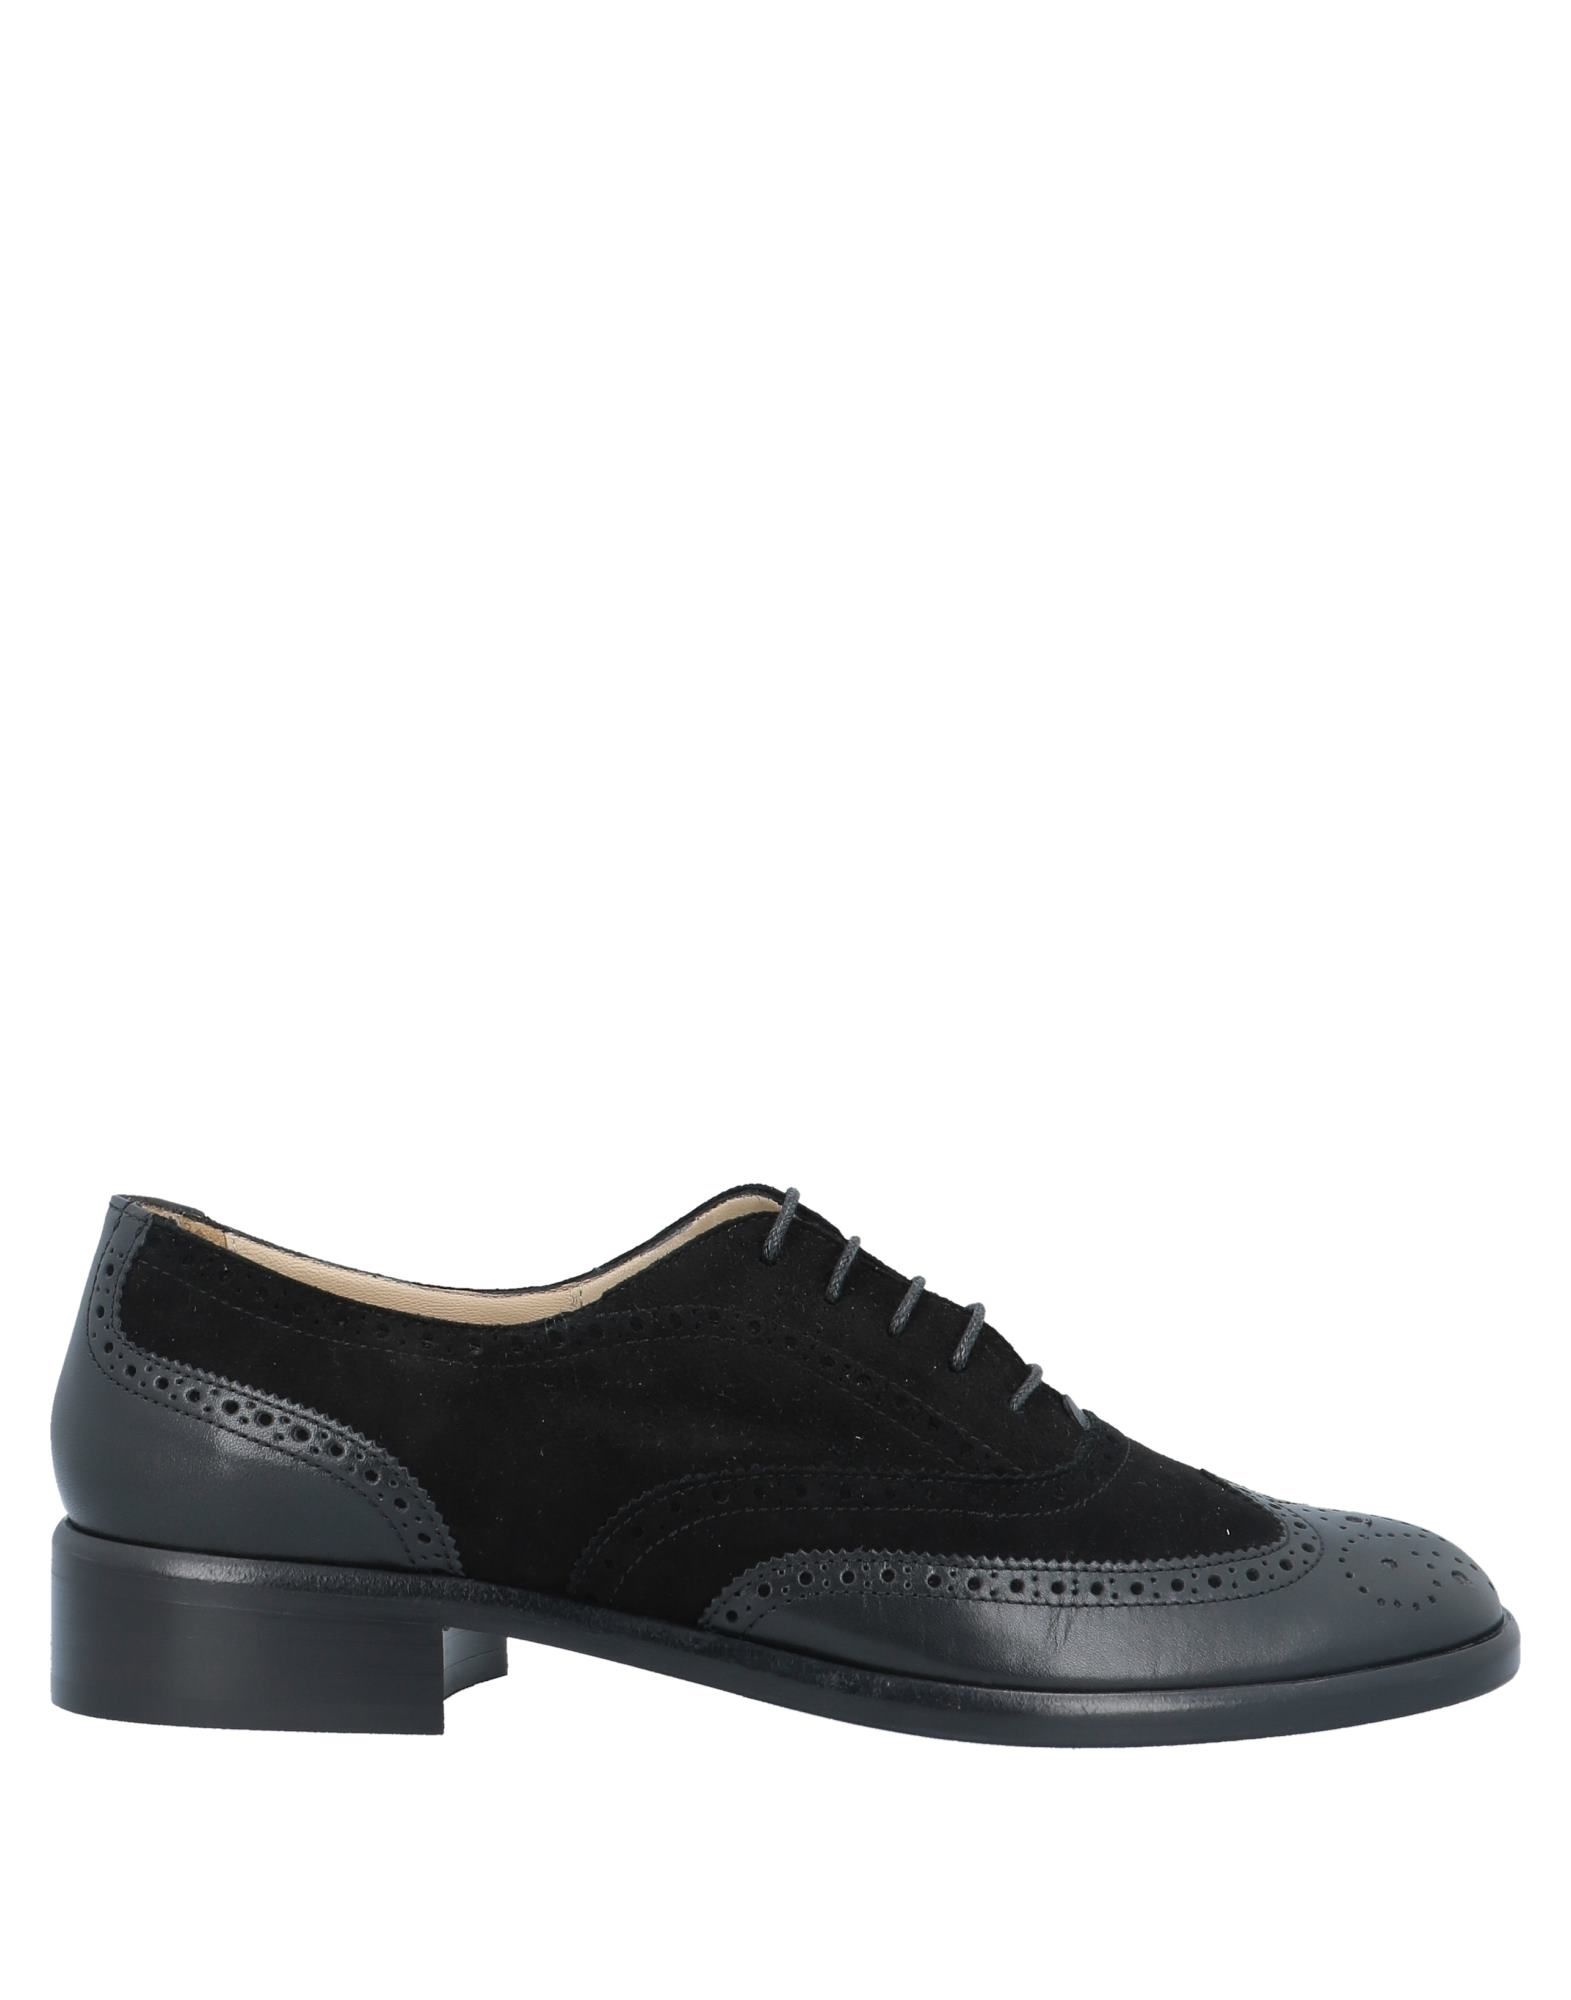 купить LA CORTE DELLA PELLE by FRANCO BALLIN Обувь на шнурках по цене 11750 рублей